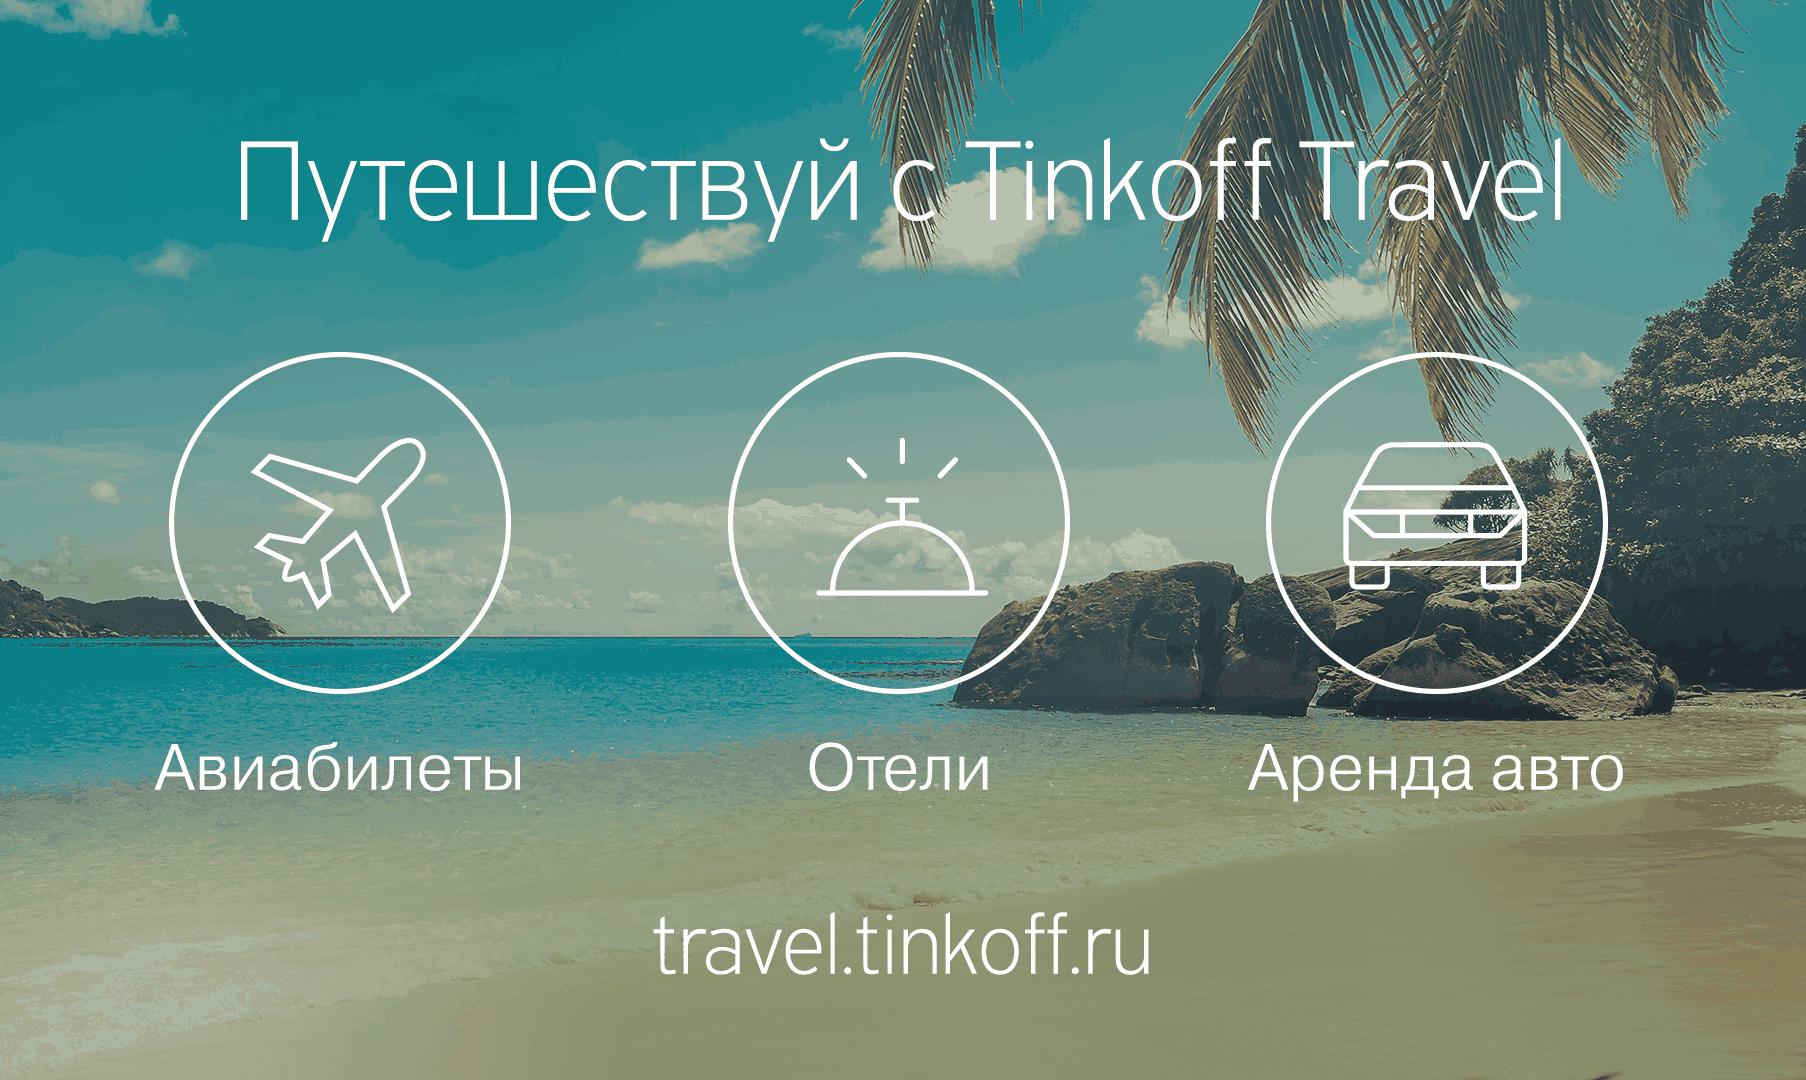 Туристический сервис банка Тинькофф